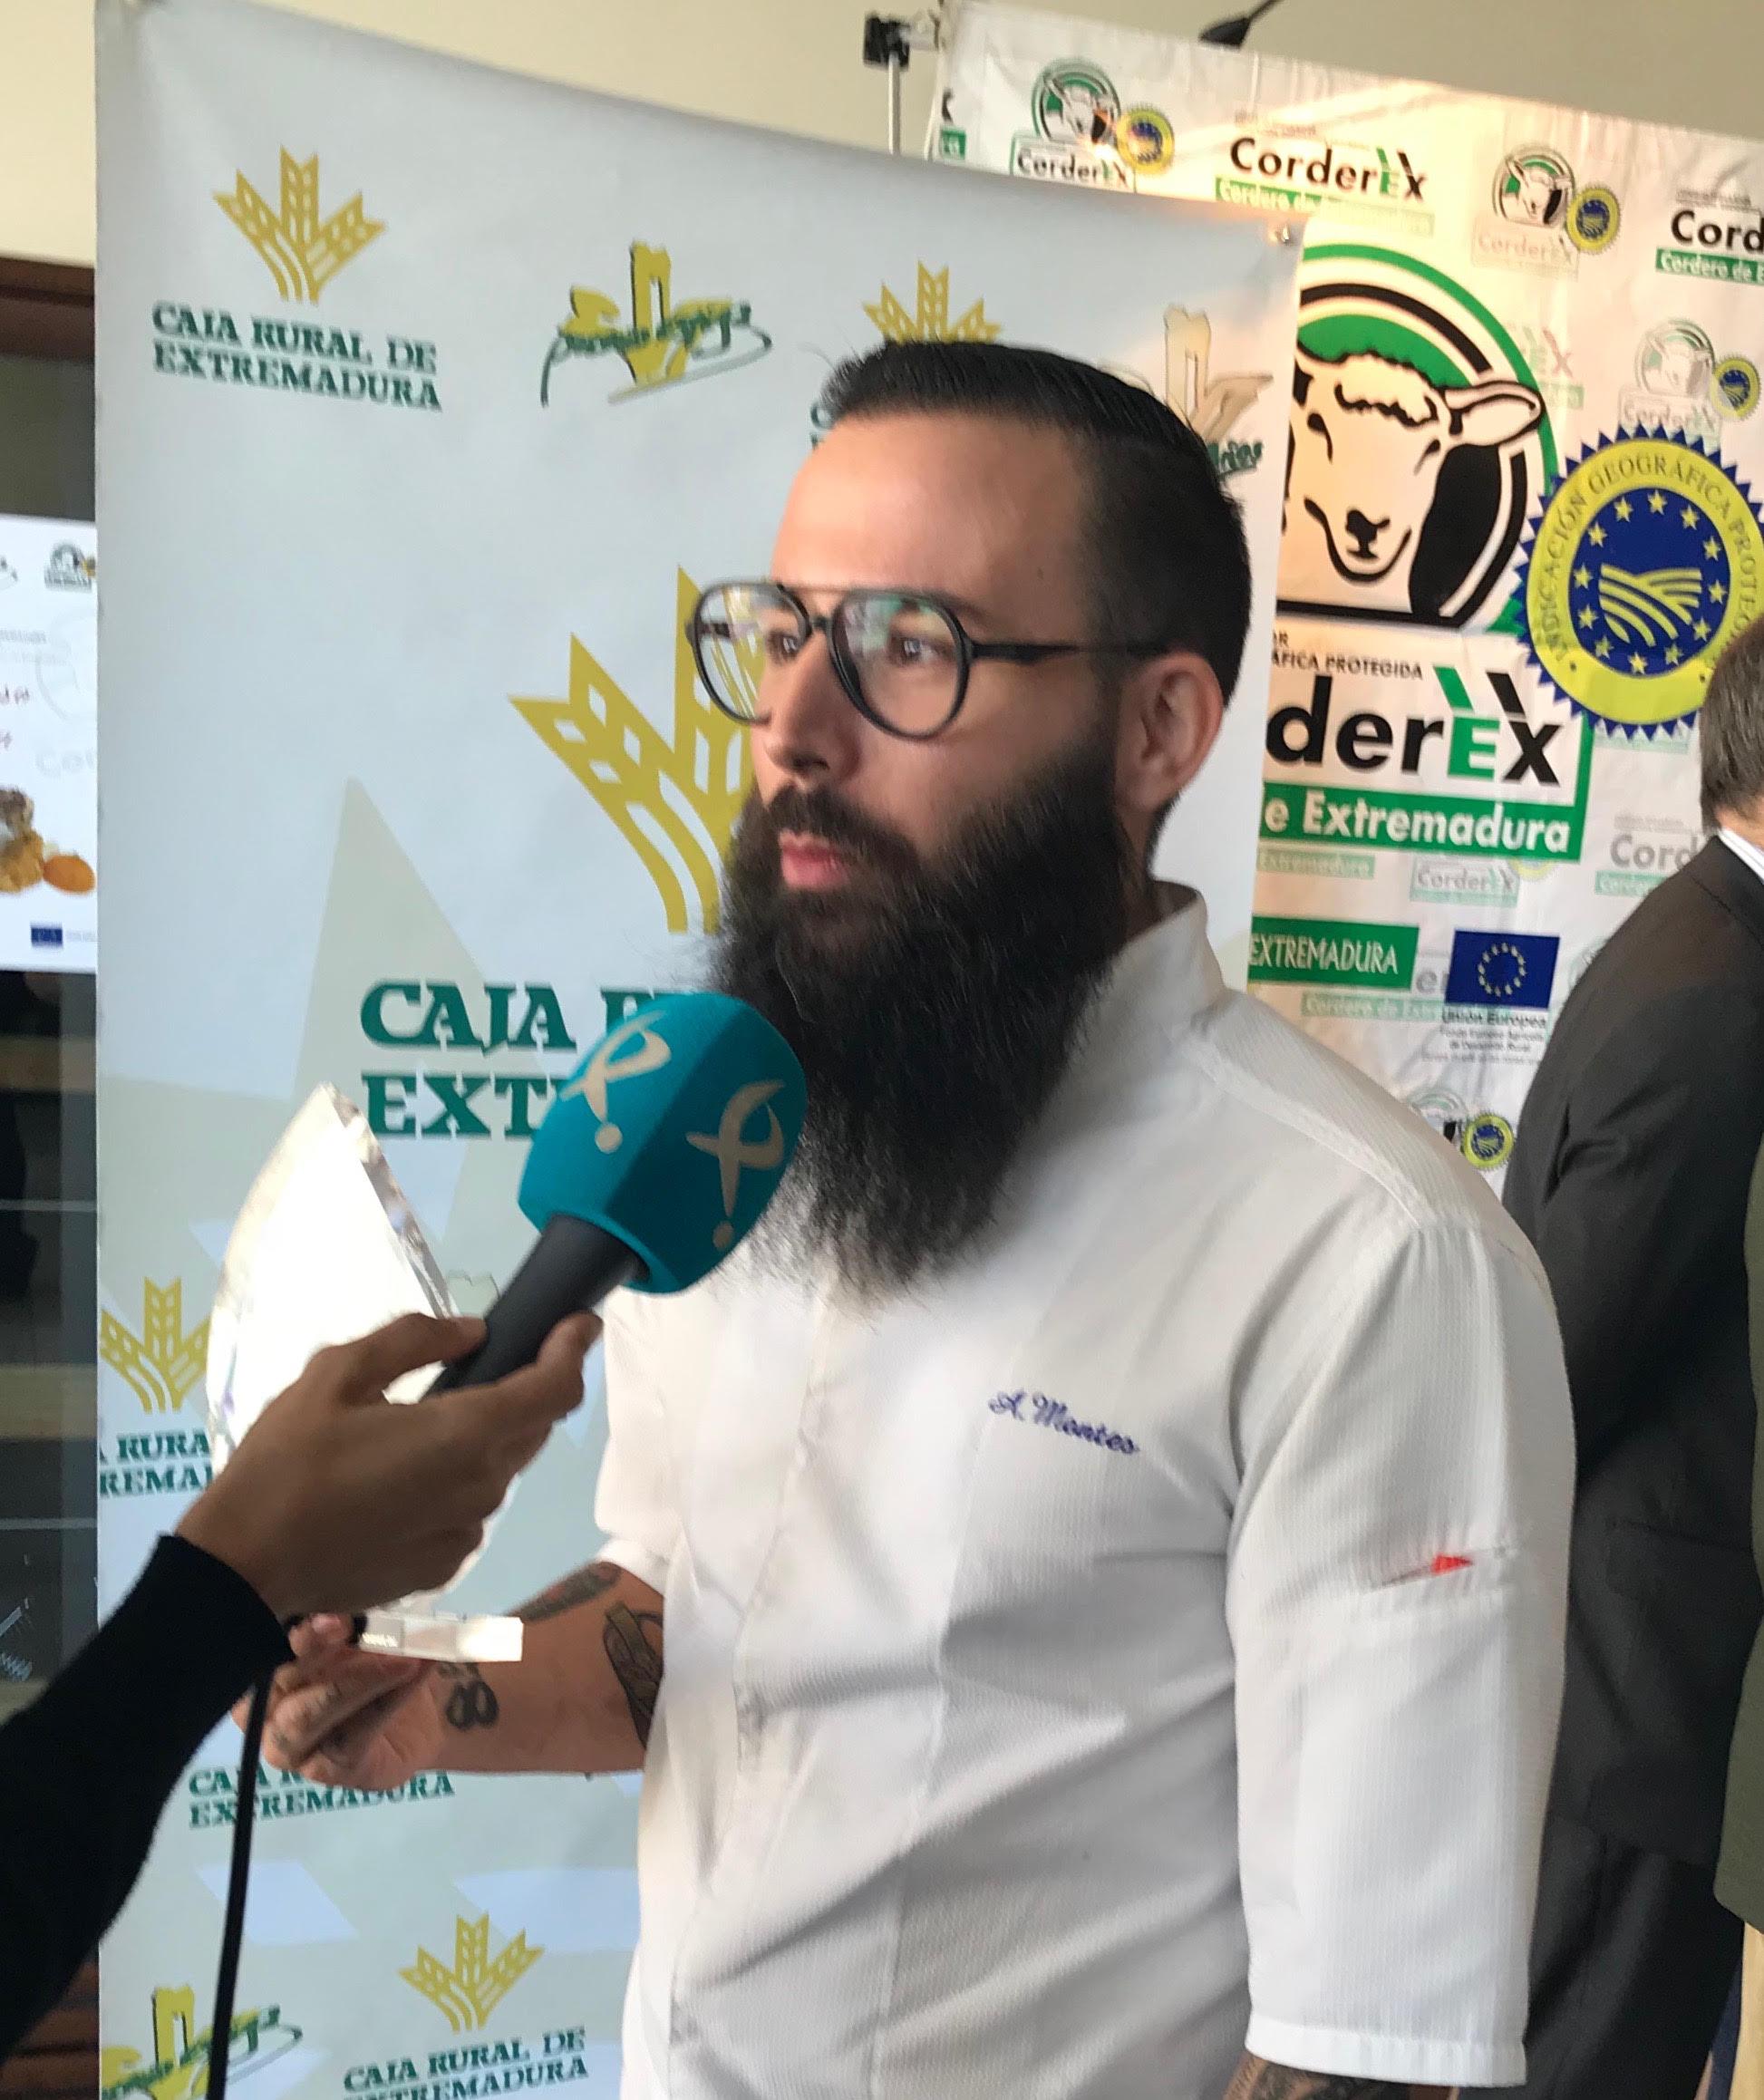 Corderex Caja Rural Premio Espiga